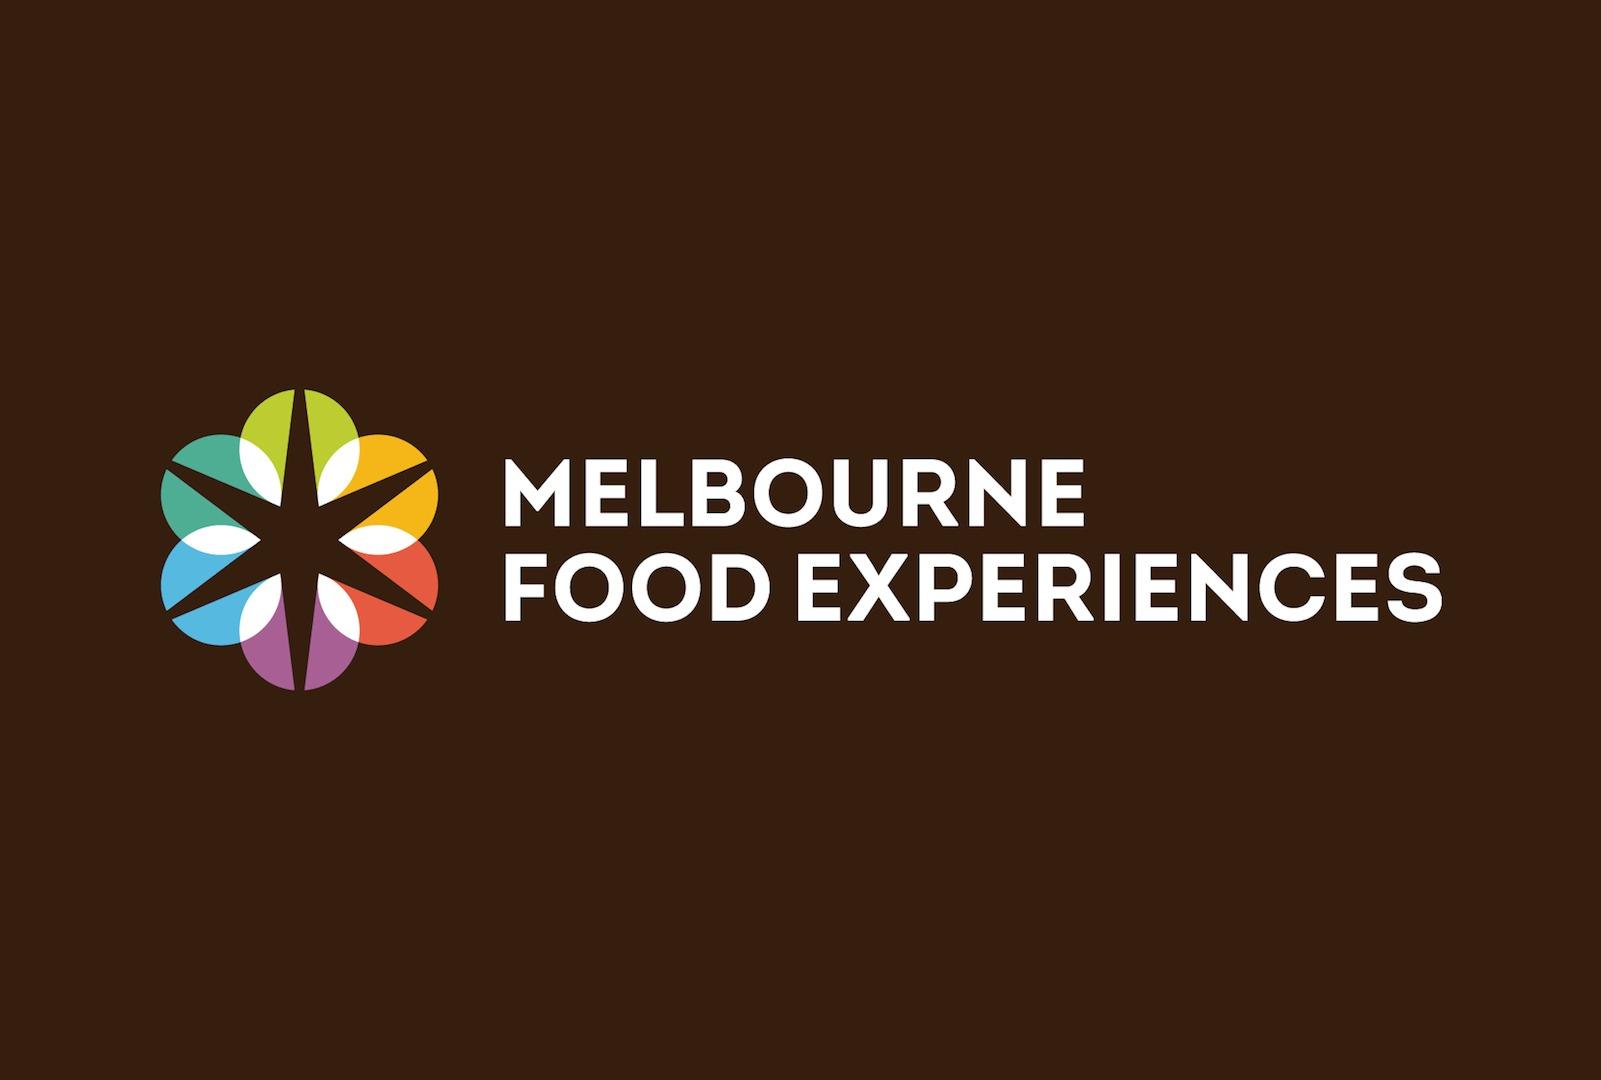 Melbourne Food Experiences